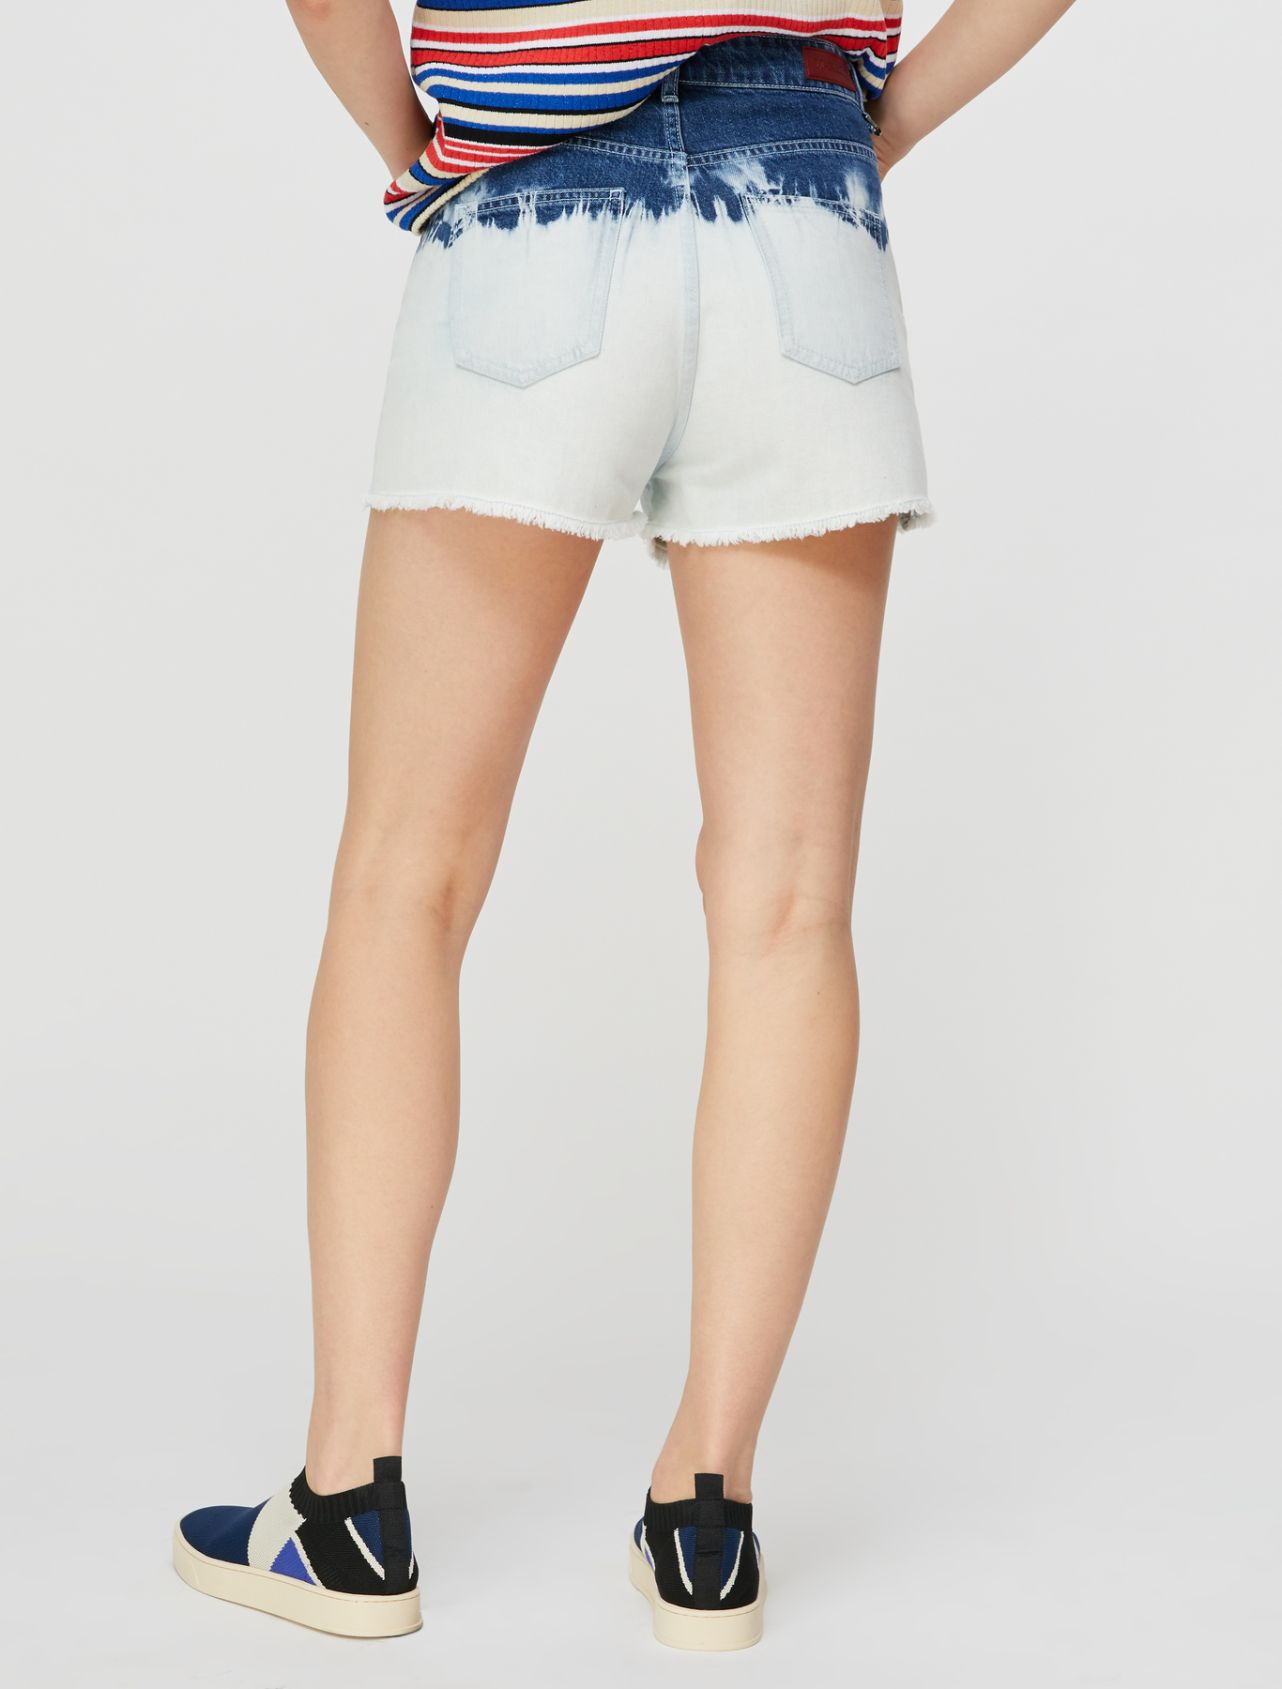 DORELLA Short trouser light blue pattern 2